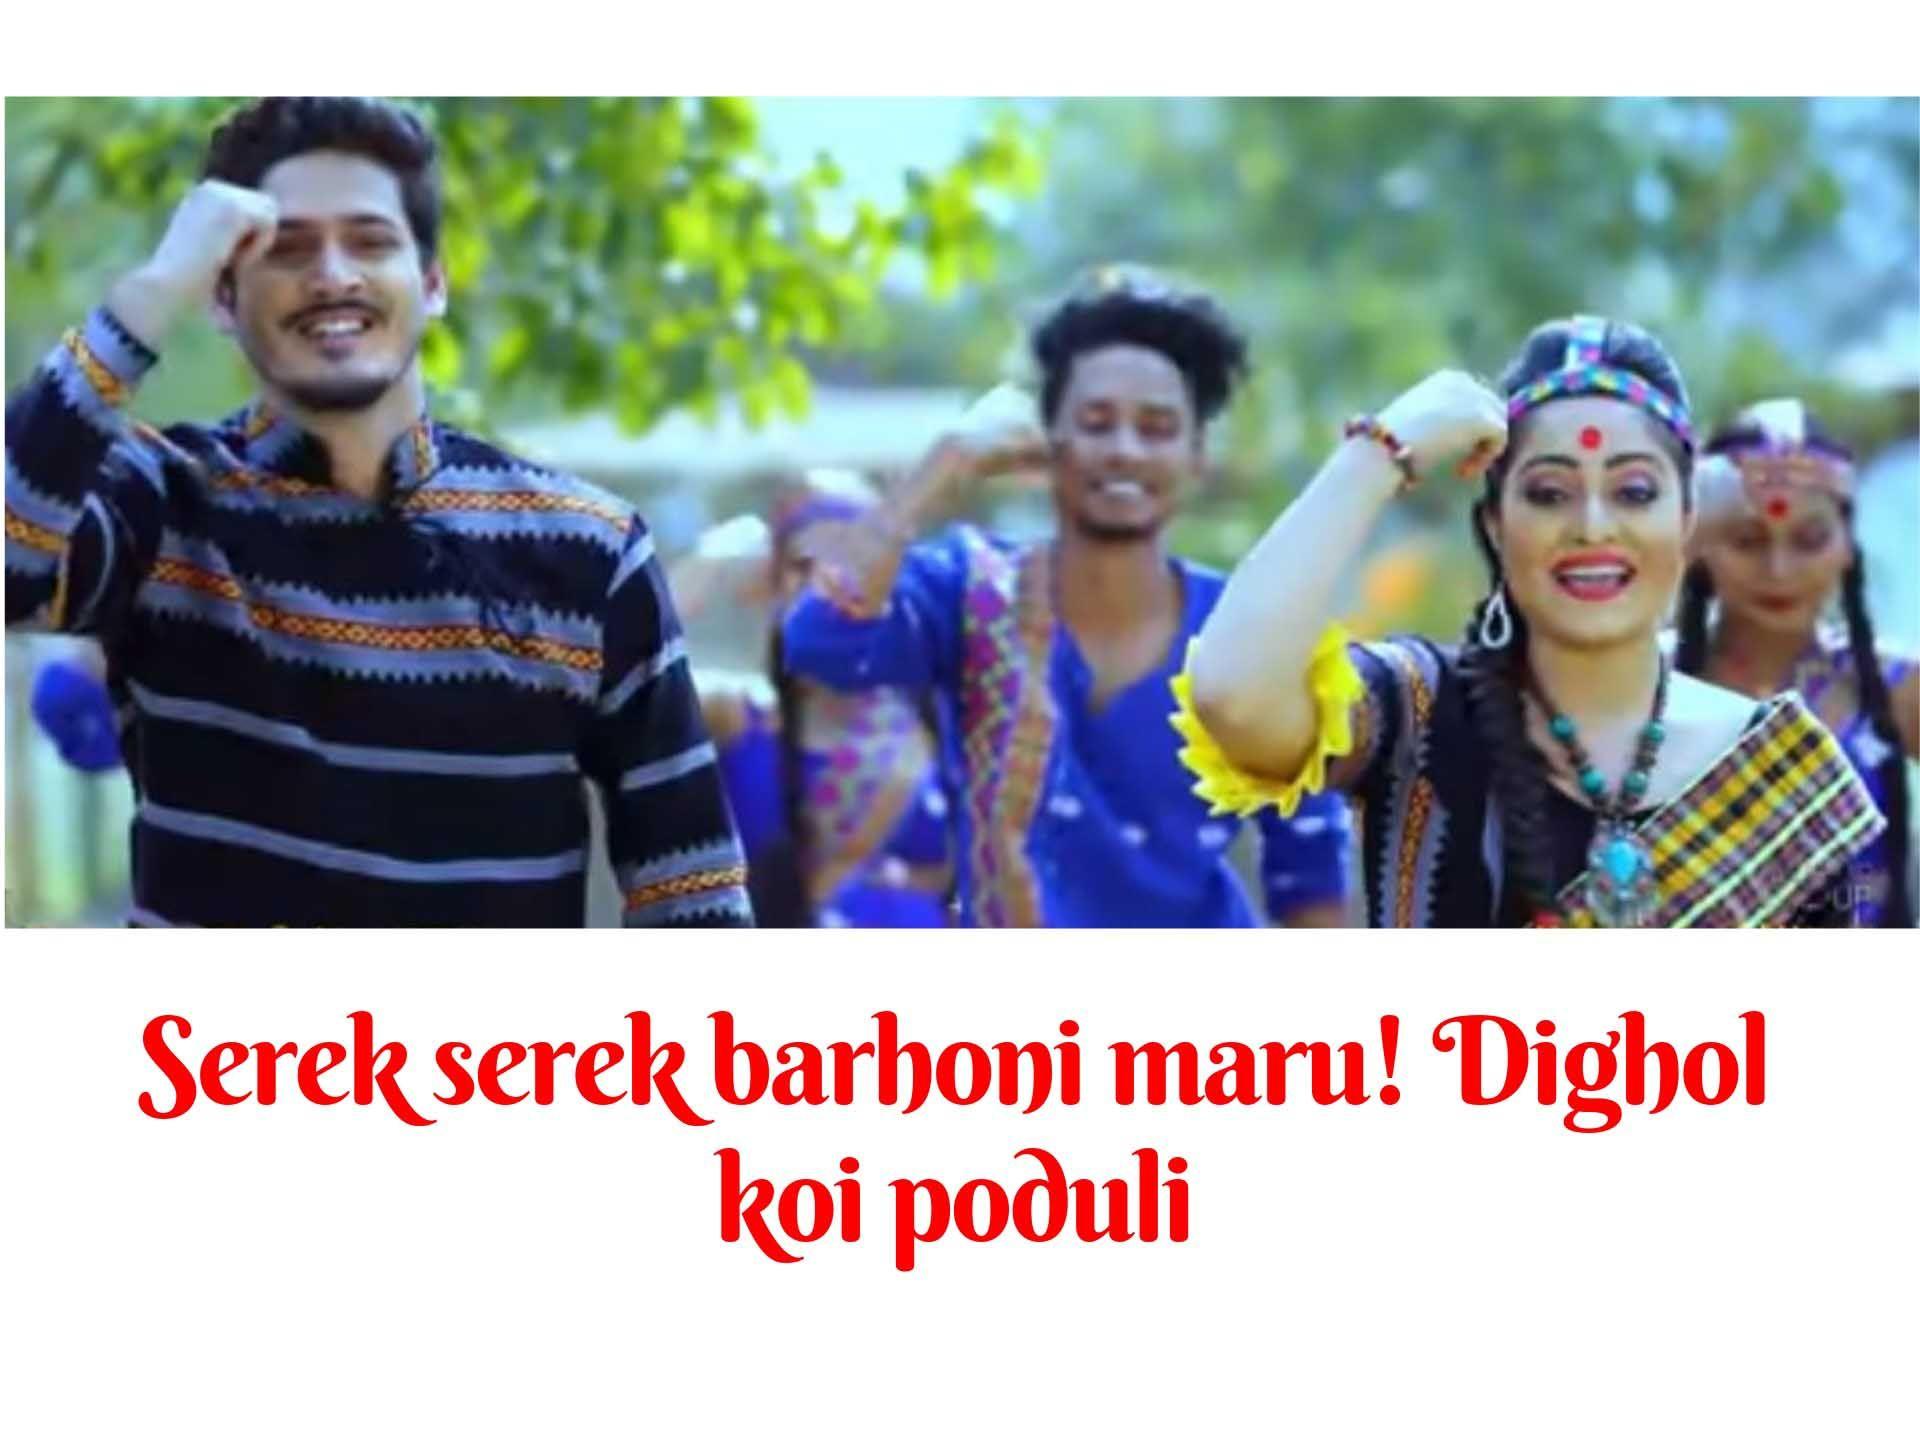 Serek Serek Assamese Song Download Serek Serek Lyrics In 2020 Songs Lyrics News Songs